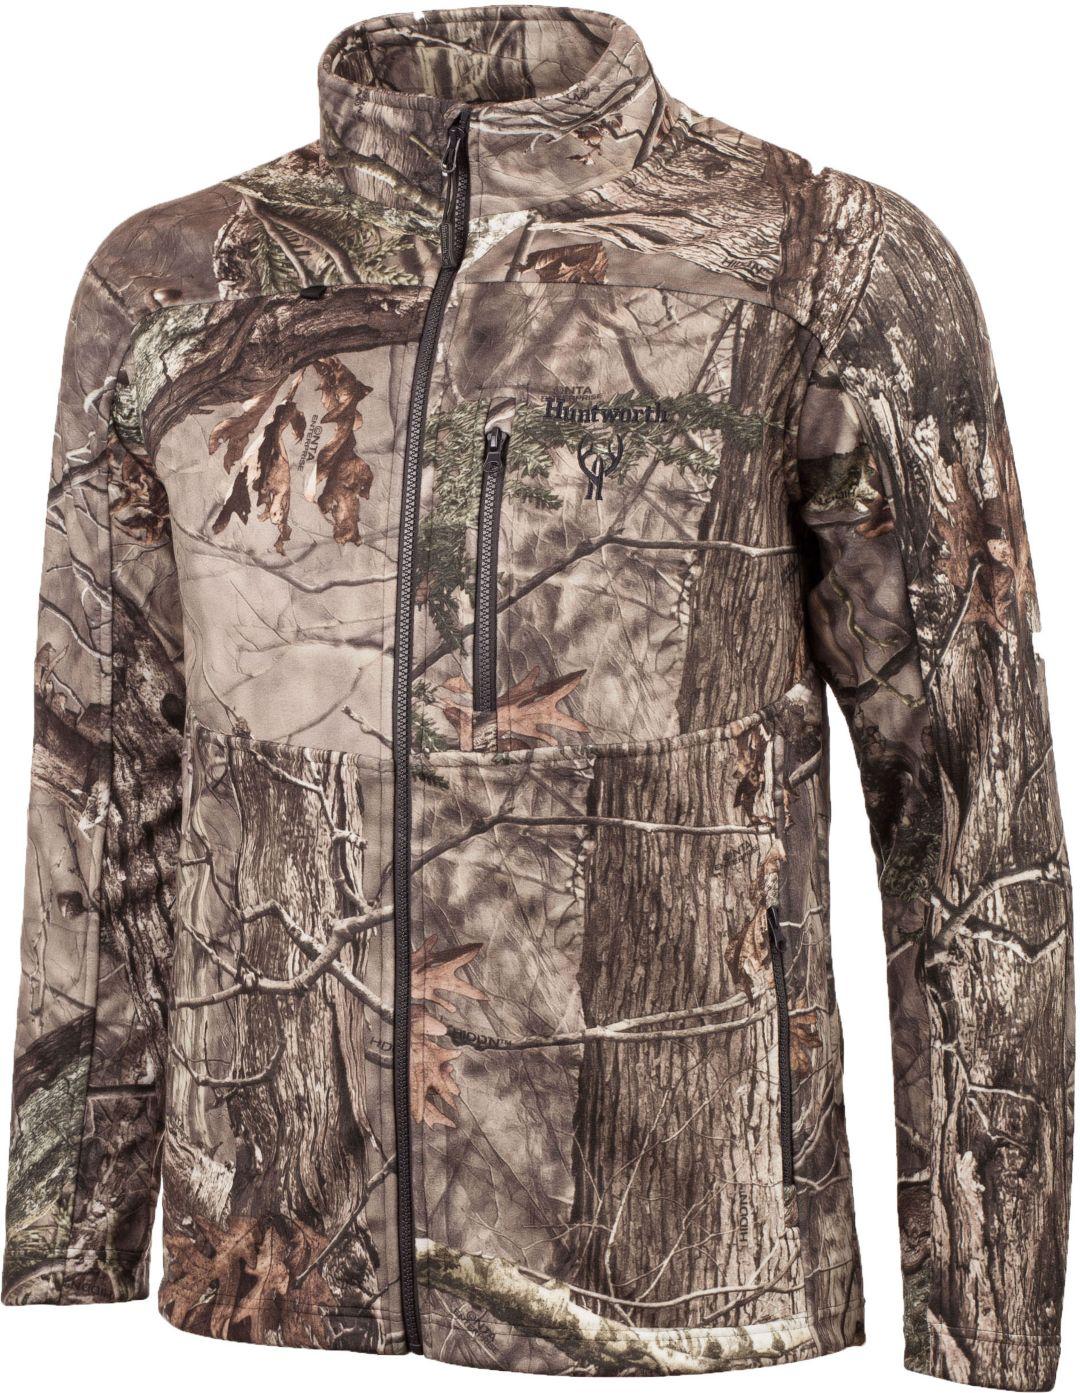 fdd4955dbeb78 Huntworth Men's Bonded Hunting Jacket | DICK'S Sporting Goods